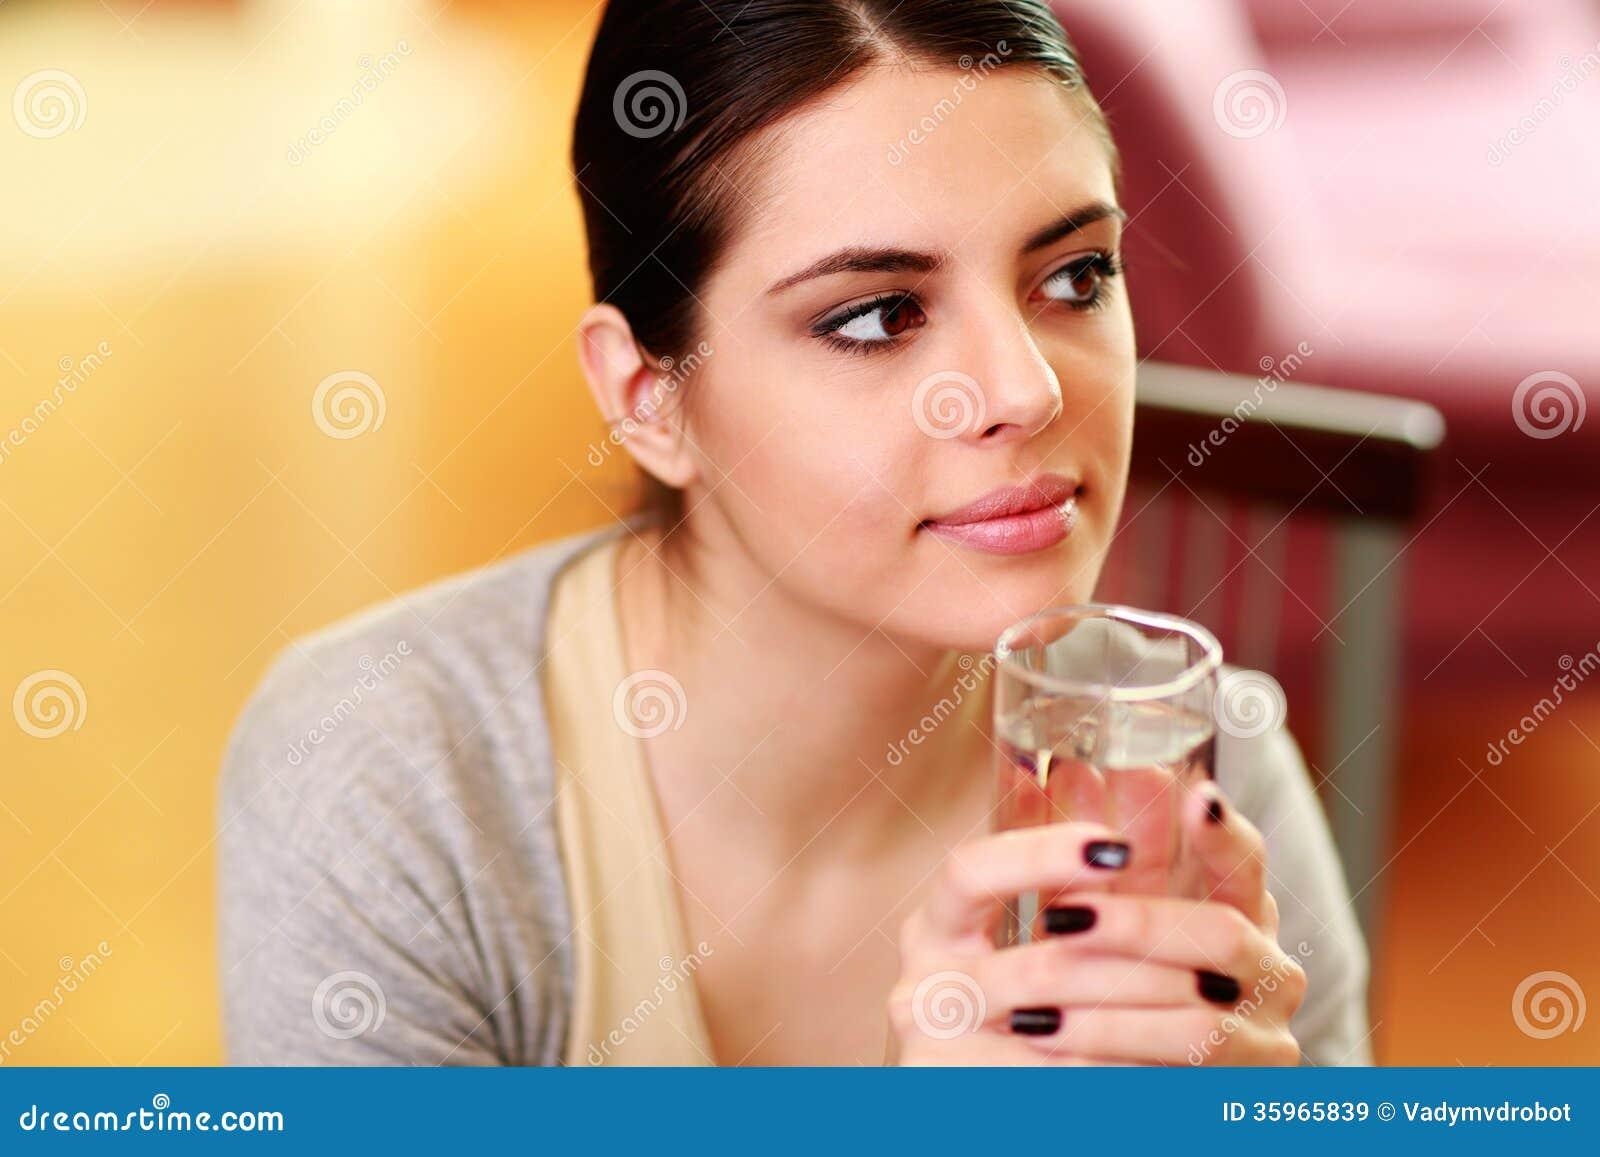 Mujer pensativa hermosa joven que se sostiene de cristal con agua